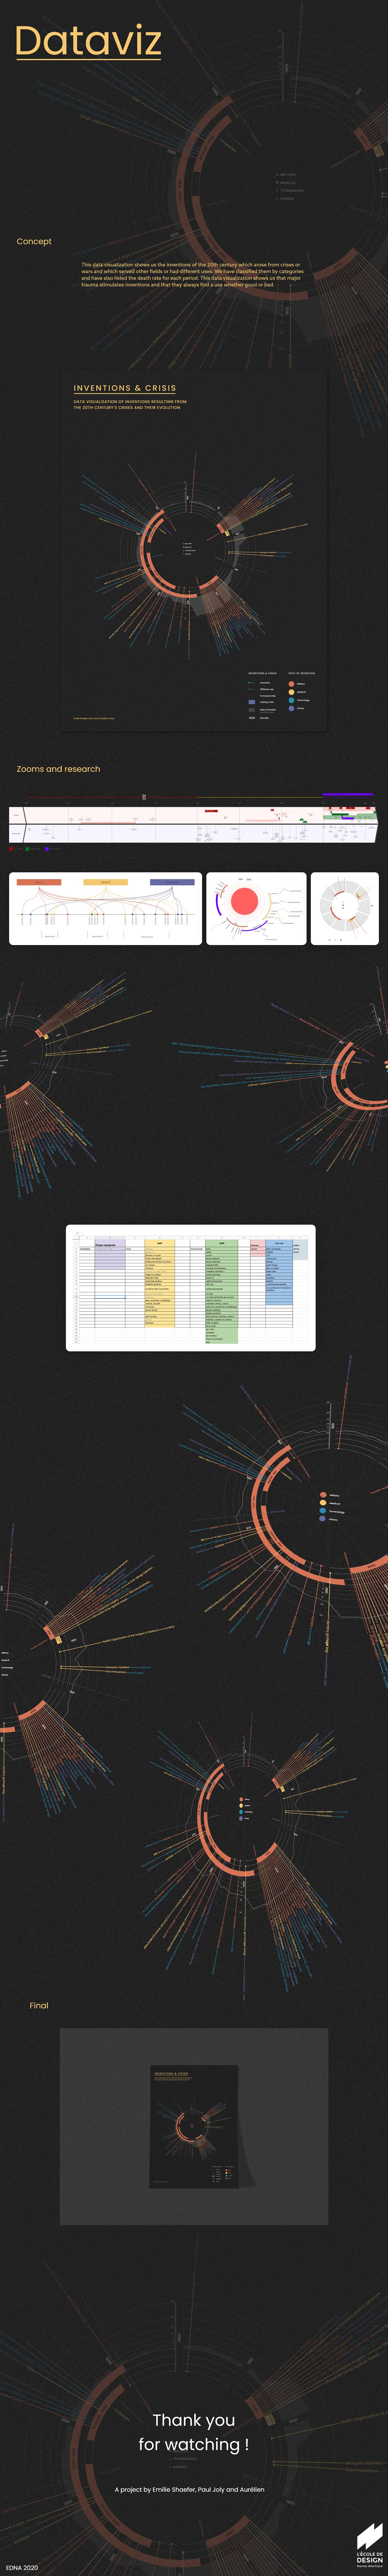 #art #Creative #data #datavisualisation #dataviz #Design #designer #graphism #infografic #interaction